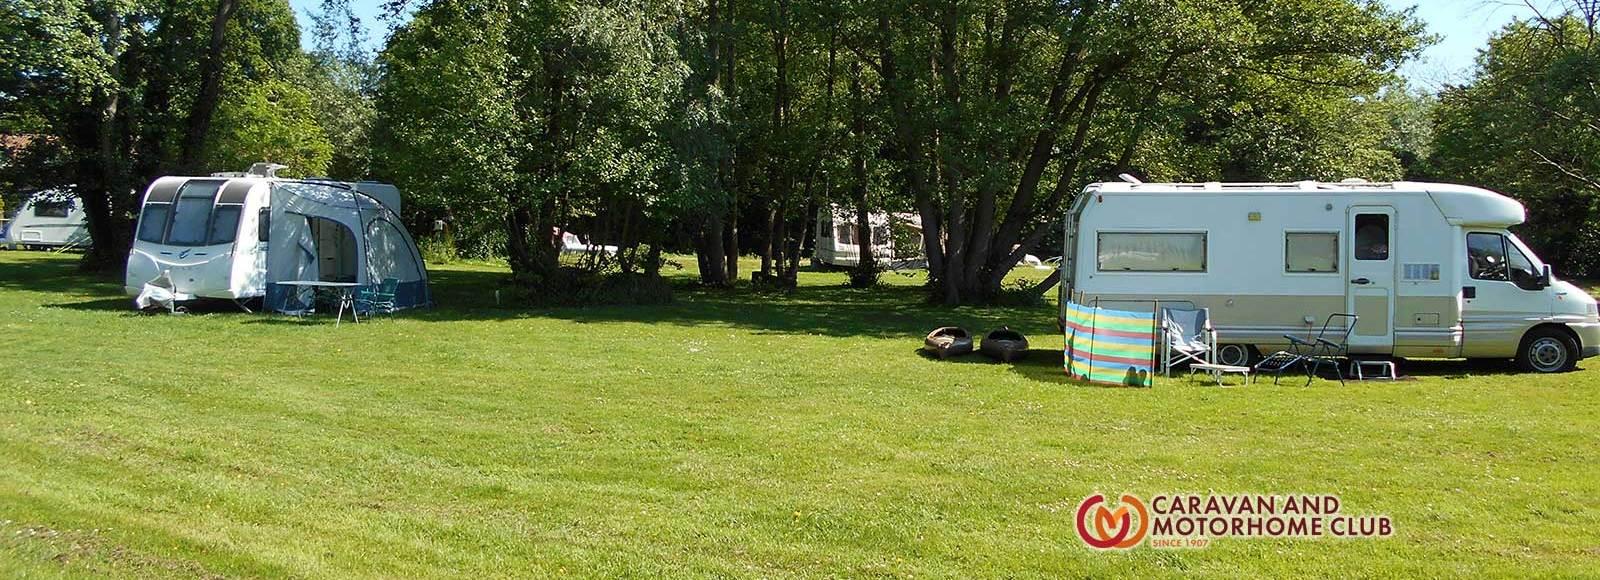 caravan & camping site Geldeston Beccles Suffolk